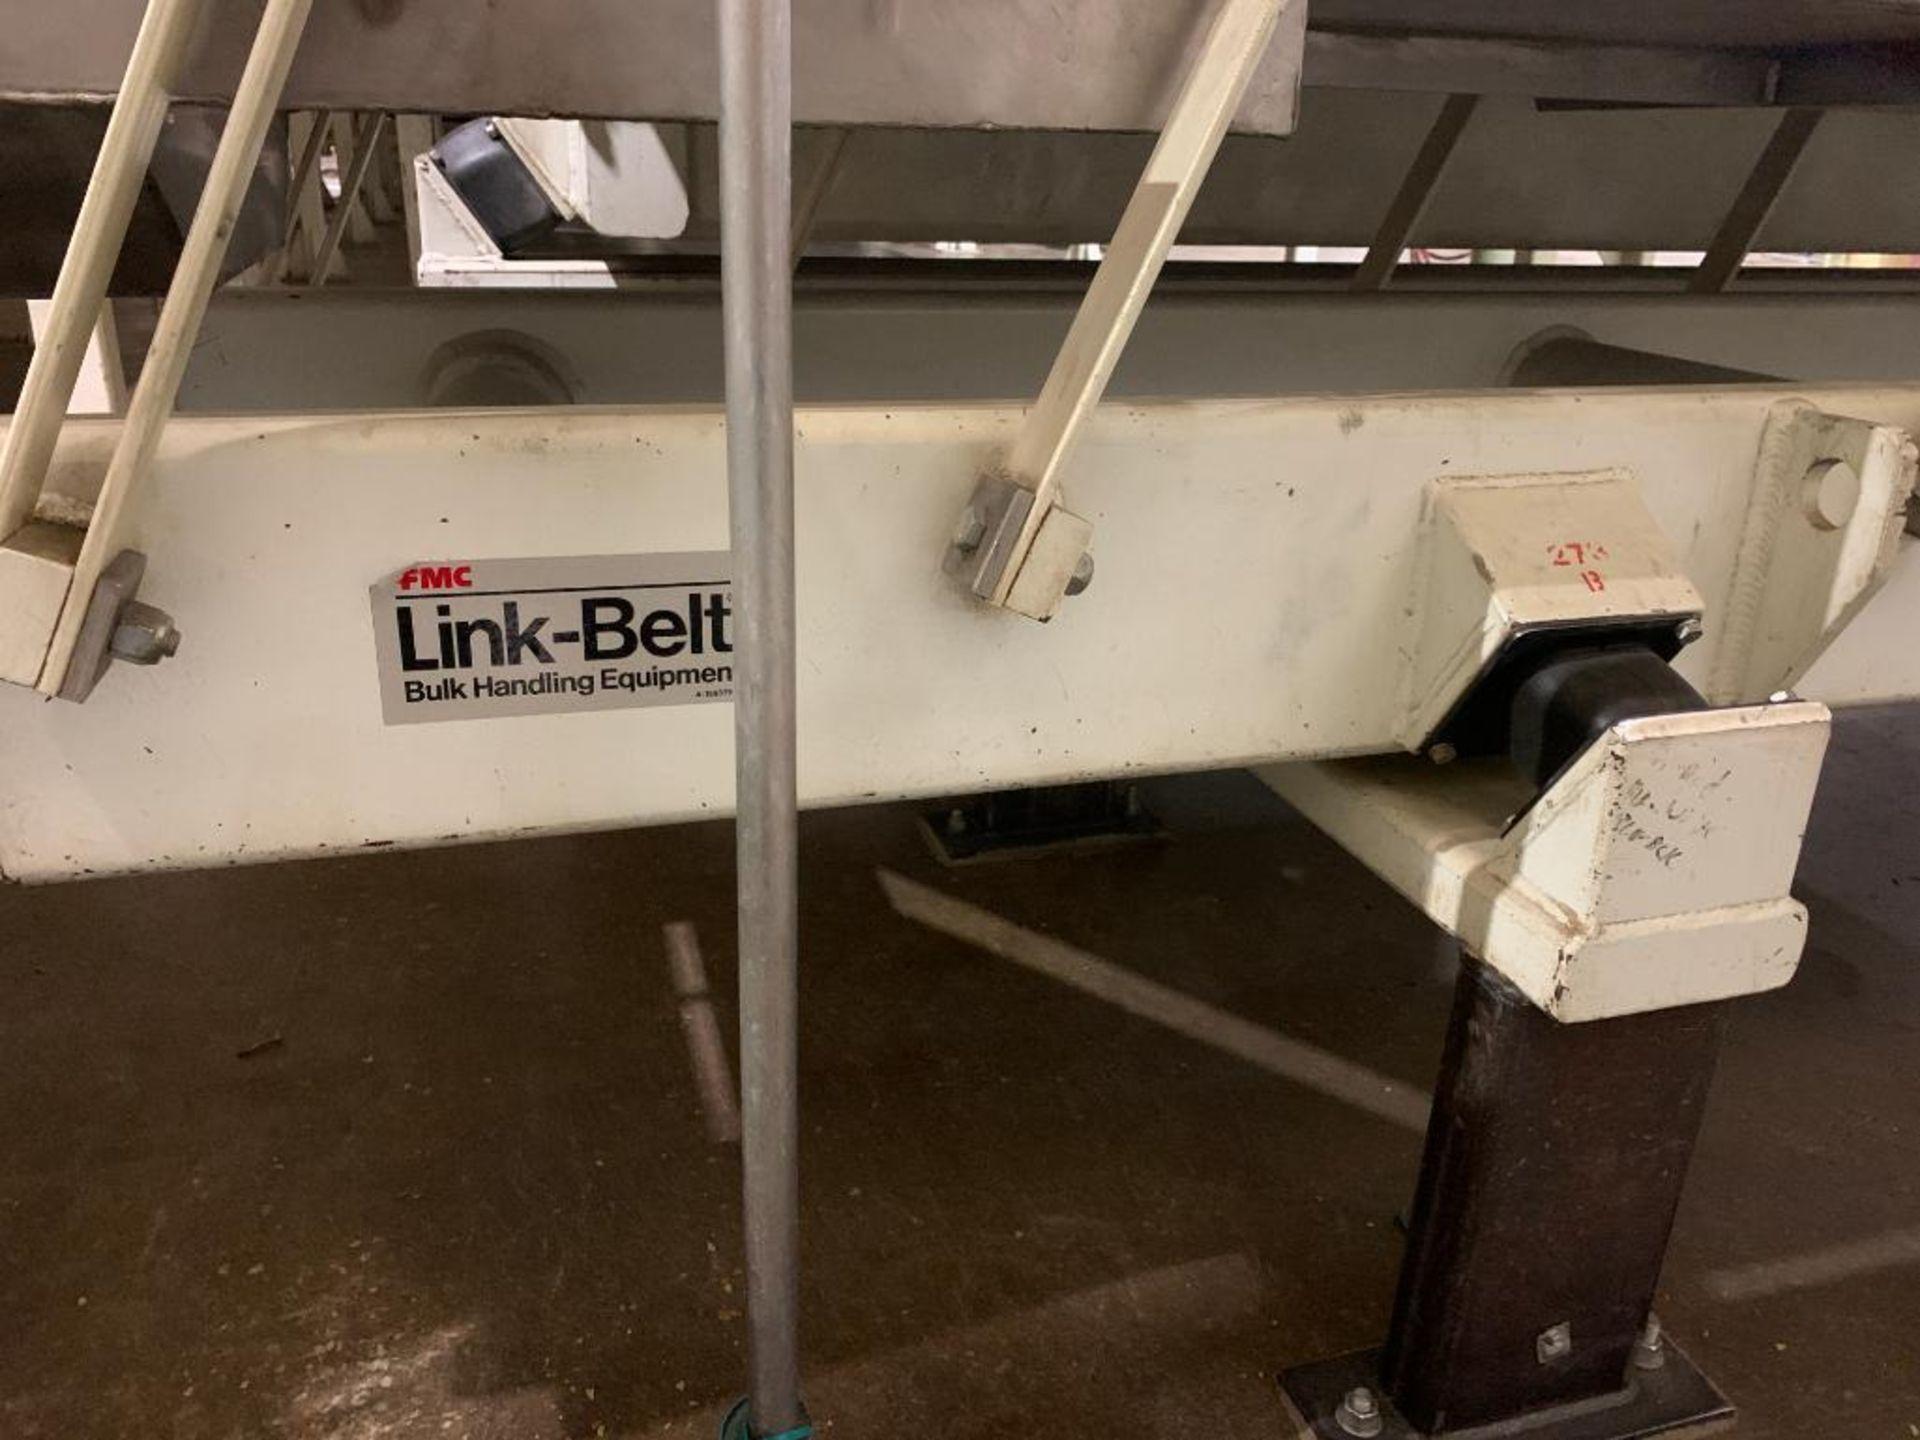 1992 Link-Belt vibratory conveyor, model LBL2405-10X12-10 - Image 9 of 34